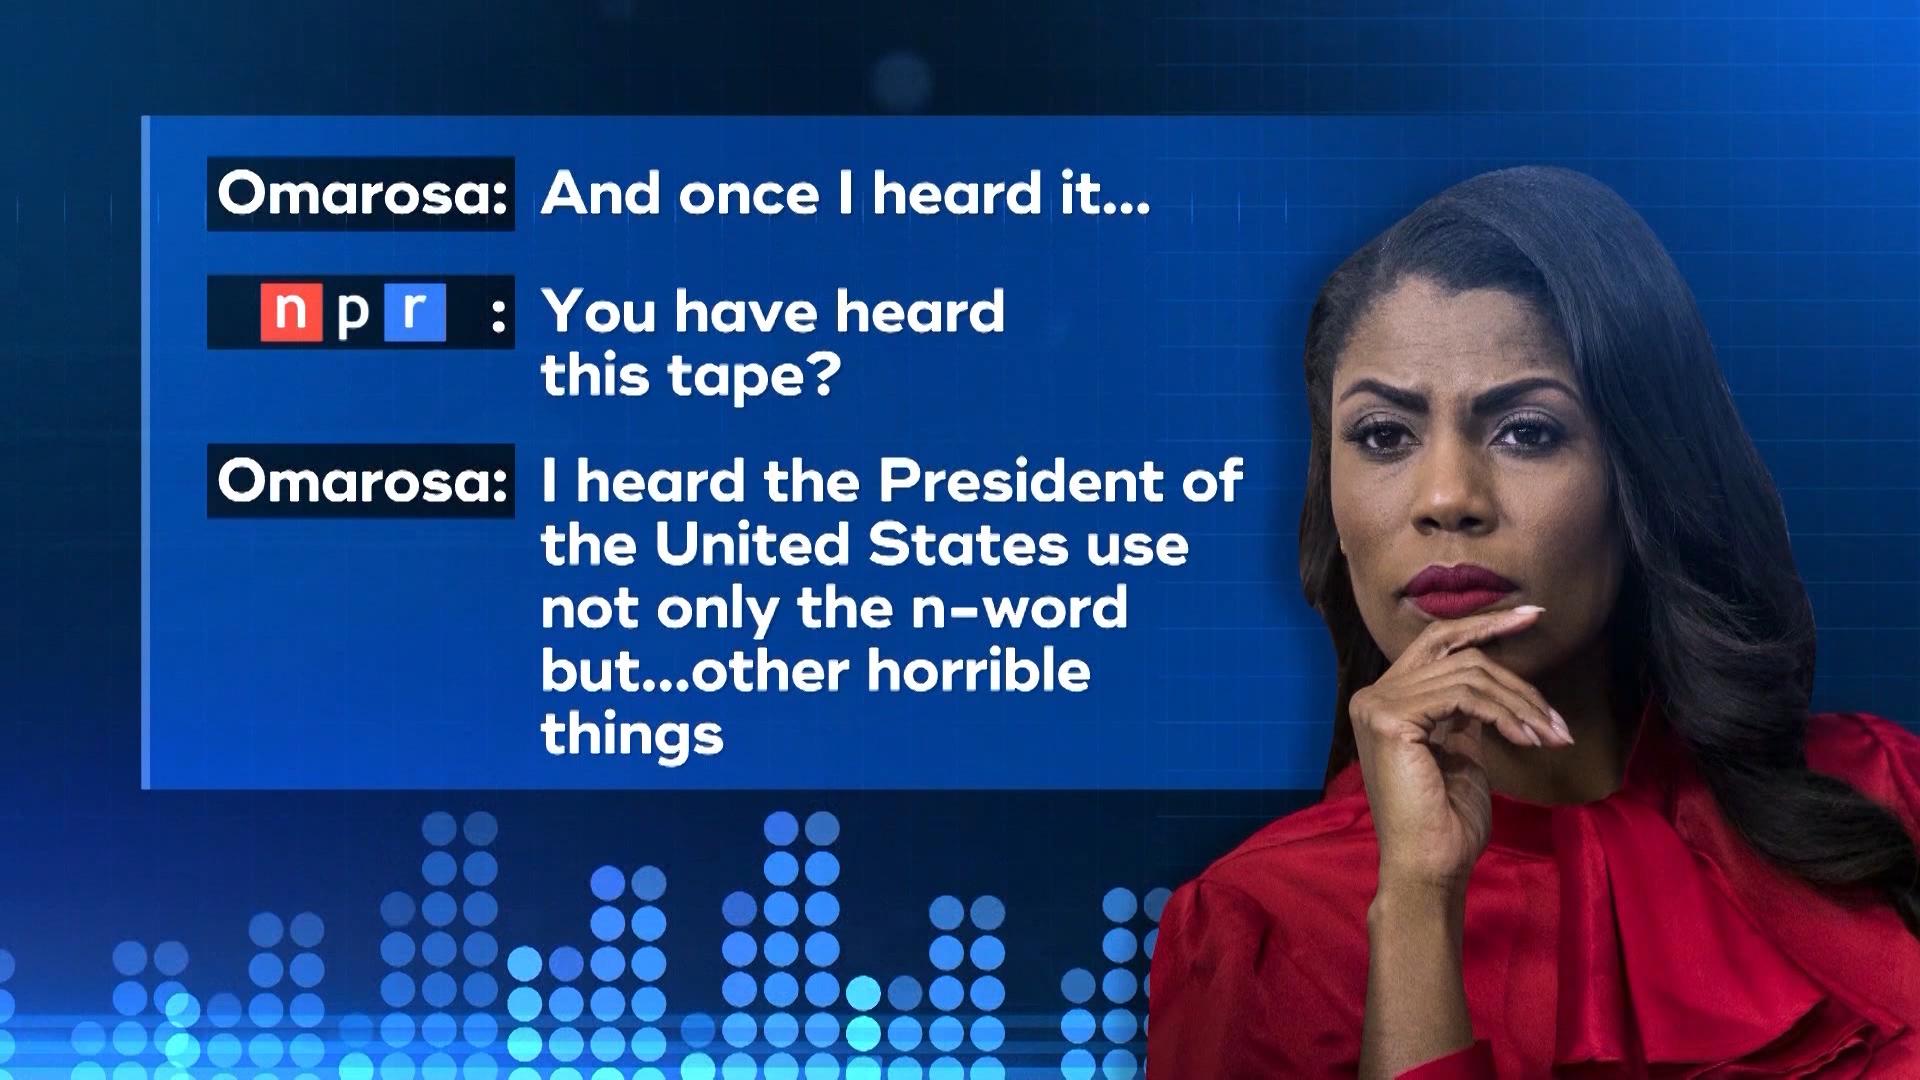 omarosa accuses donald trump of using n word multiple times on